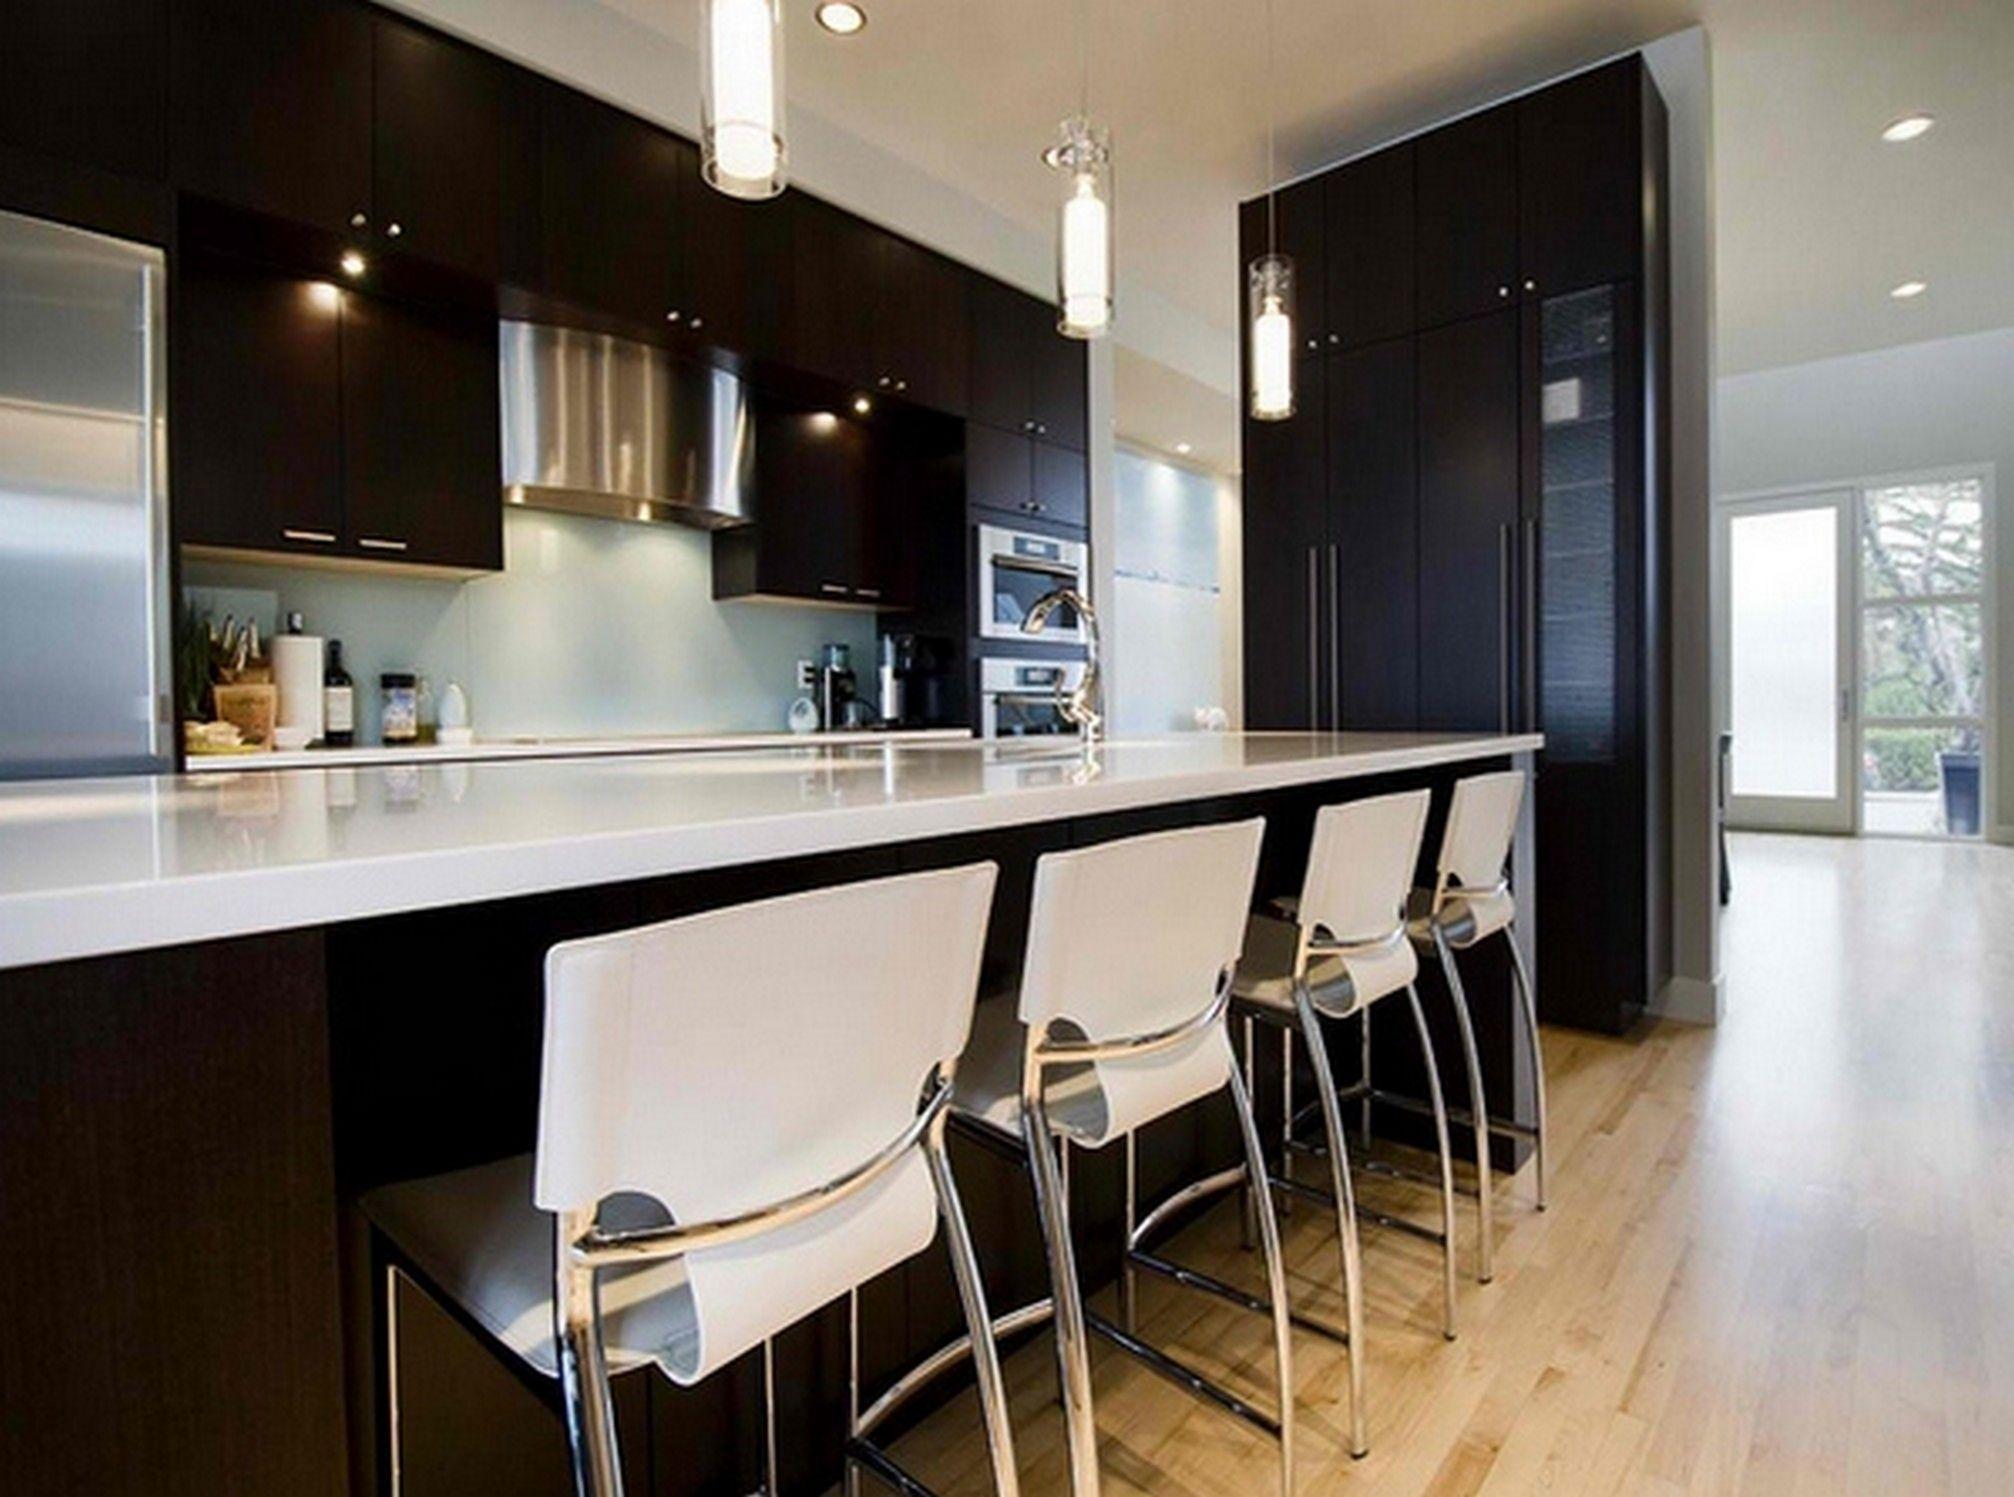 Wonderful 25 Small Kitchen Bar Design Ideas For Your Home Modern Kitchen Bar Modern Bar Stools Kitchen Kitchen Bar Design